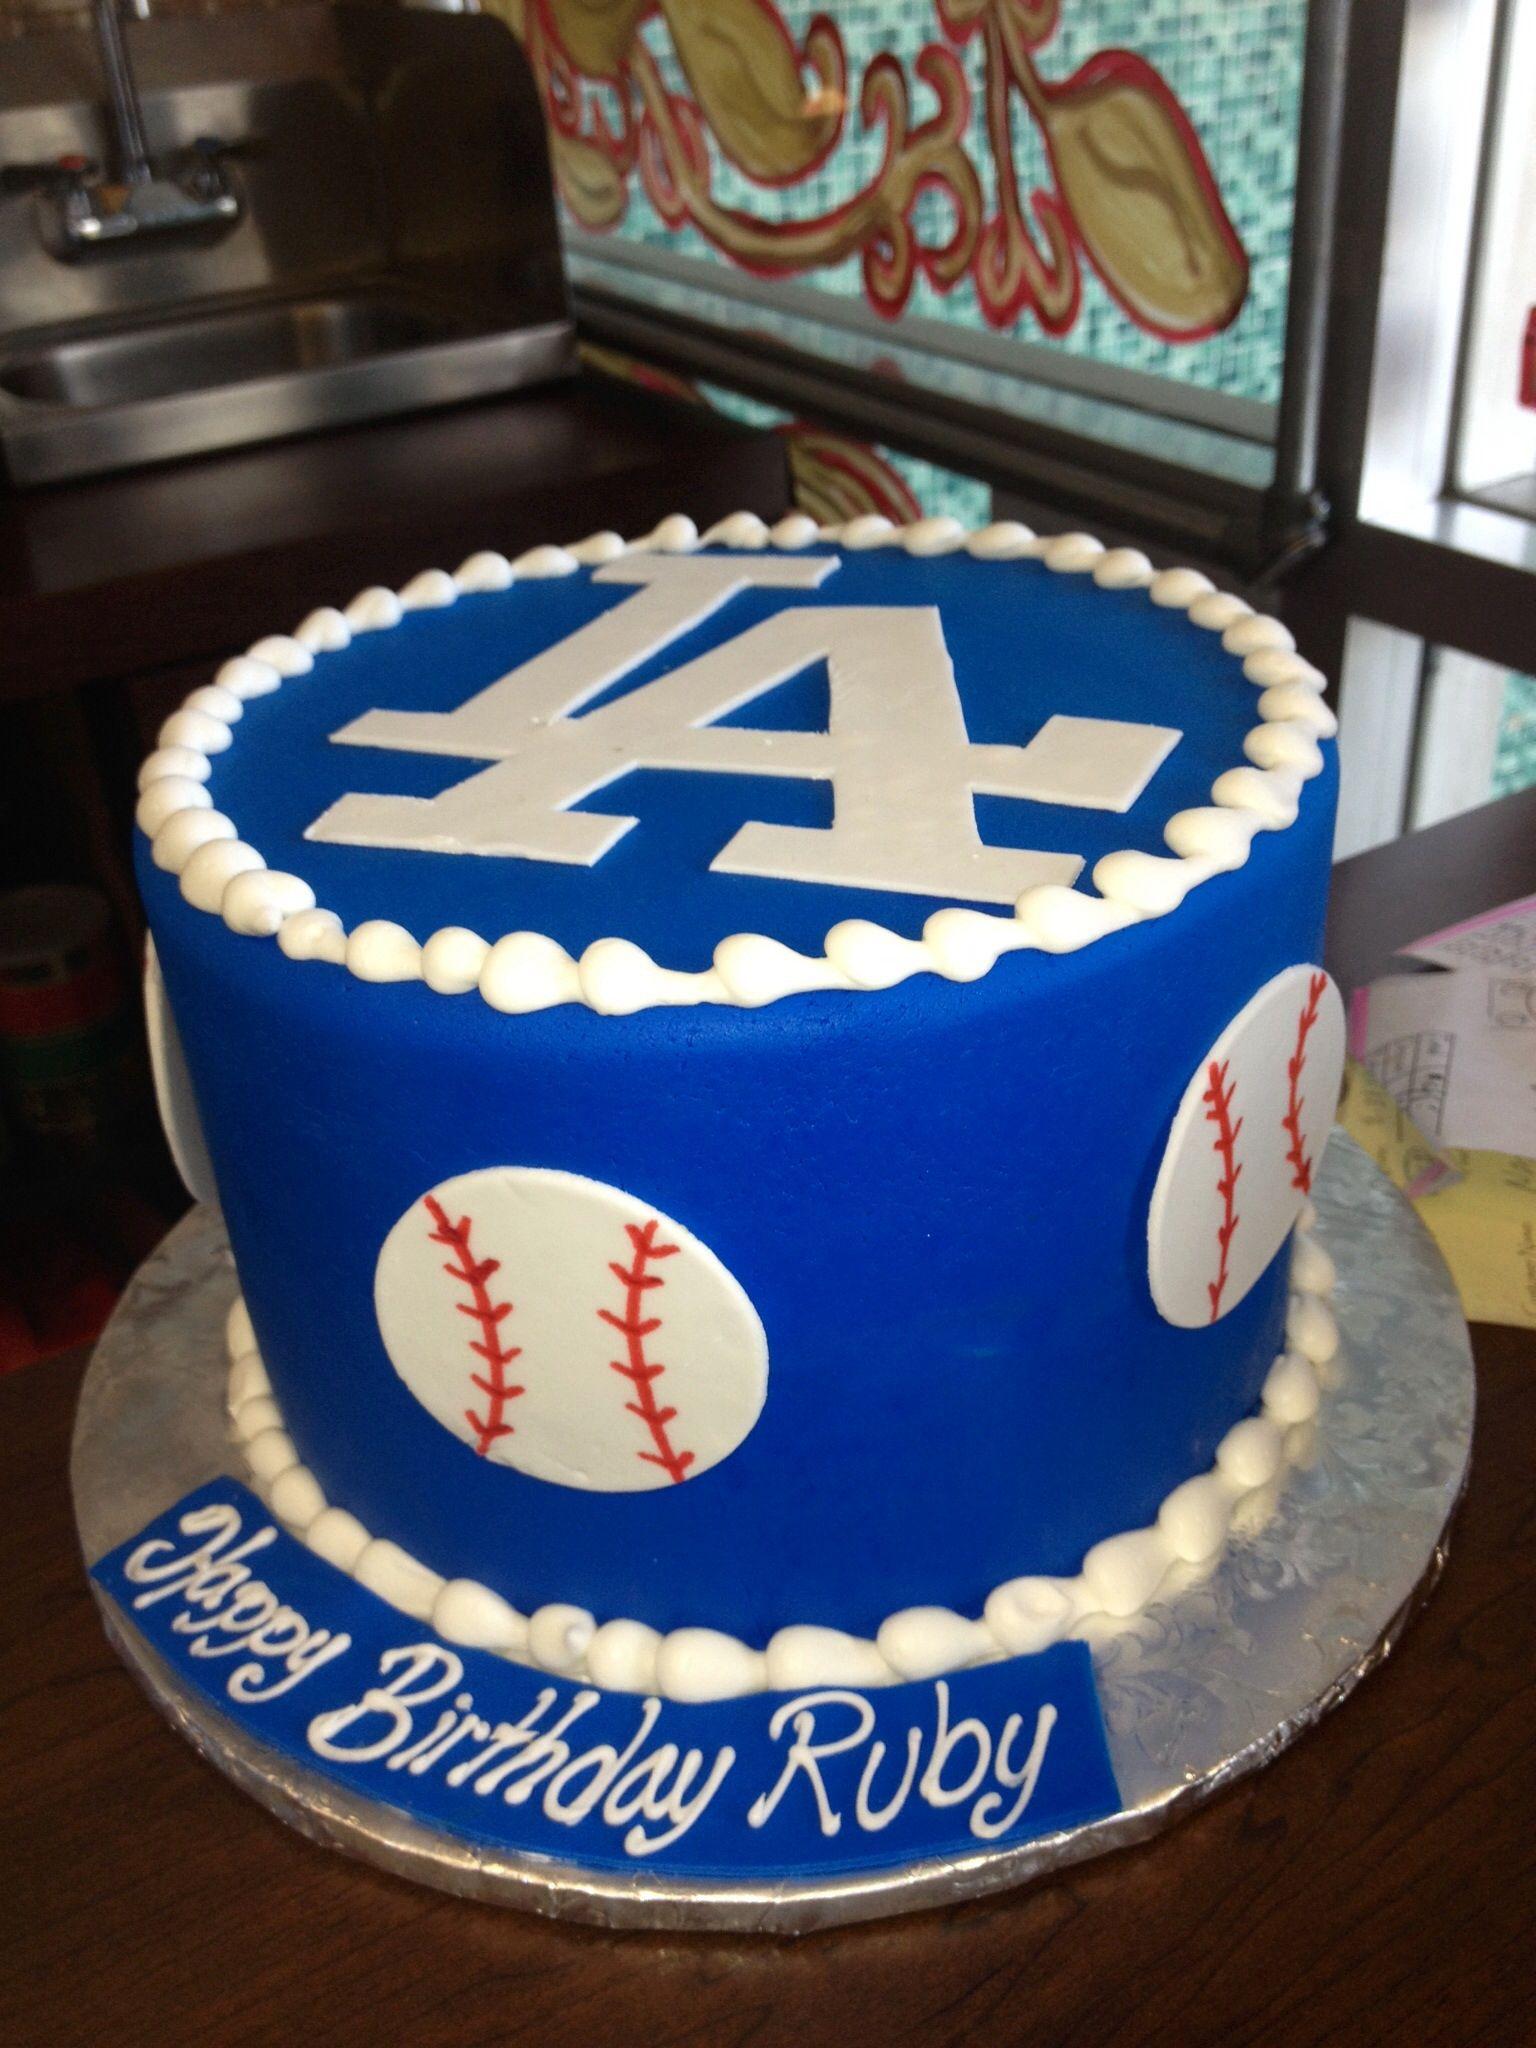 Marvelous Dodger Cake Dodgers Birthday Party Cool Birthday Cakes Funny Birthday Cards Online Benoljebrpdamsfinfo